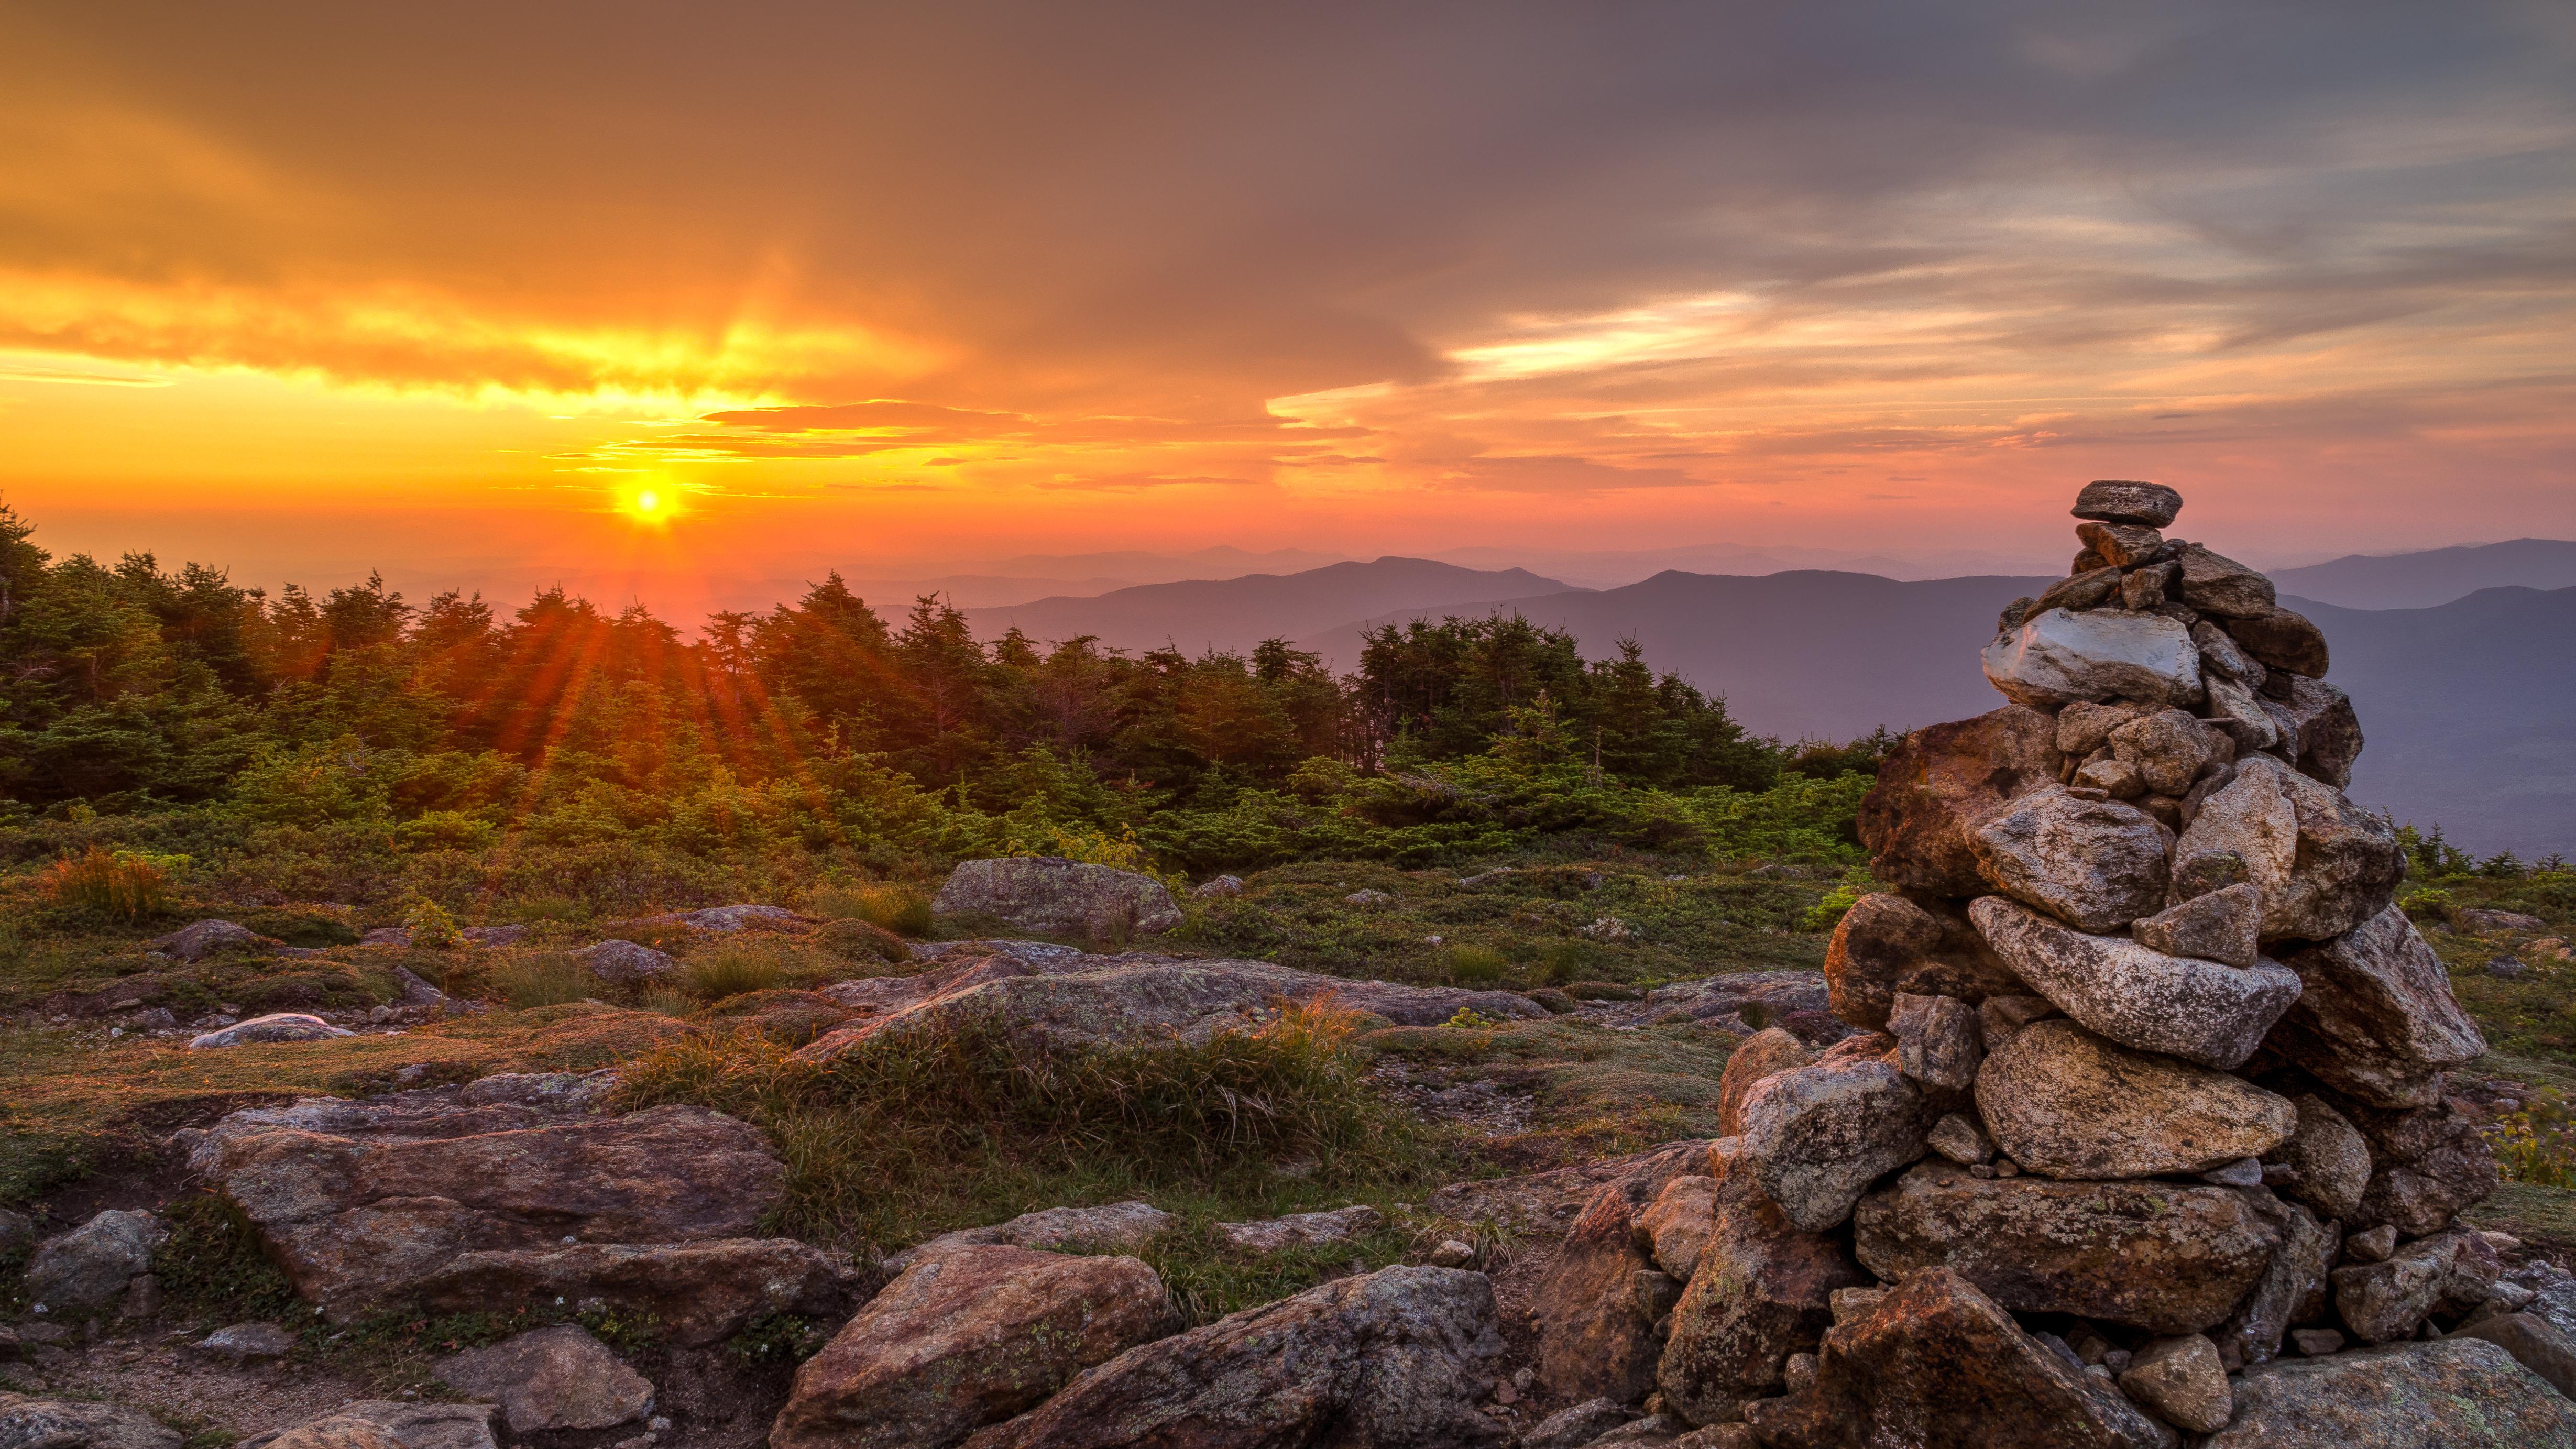 Sunrise on a mountain top